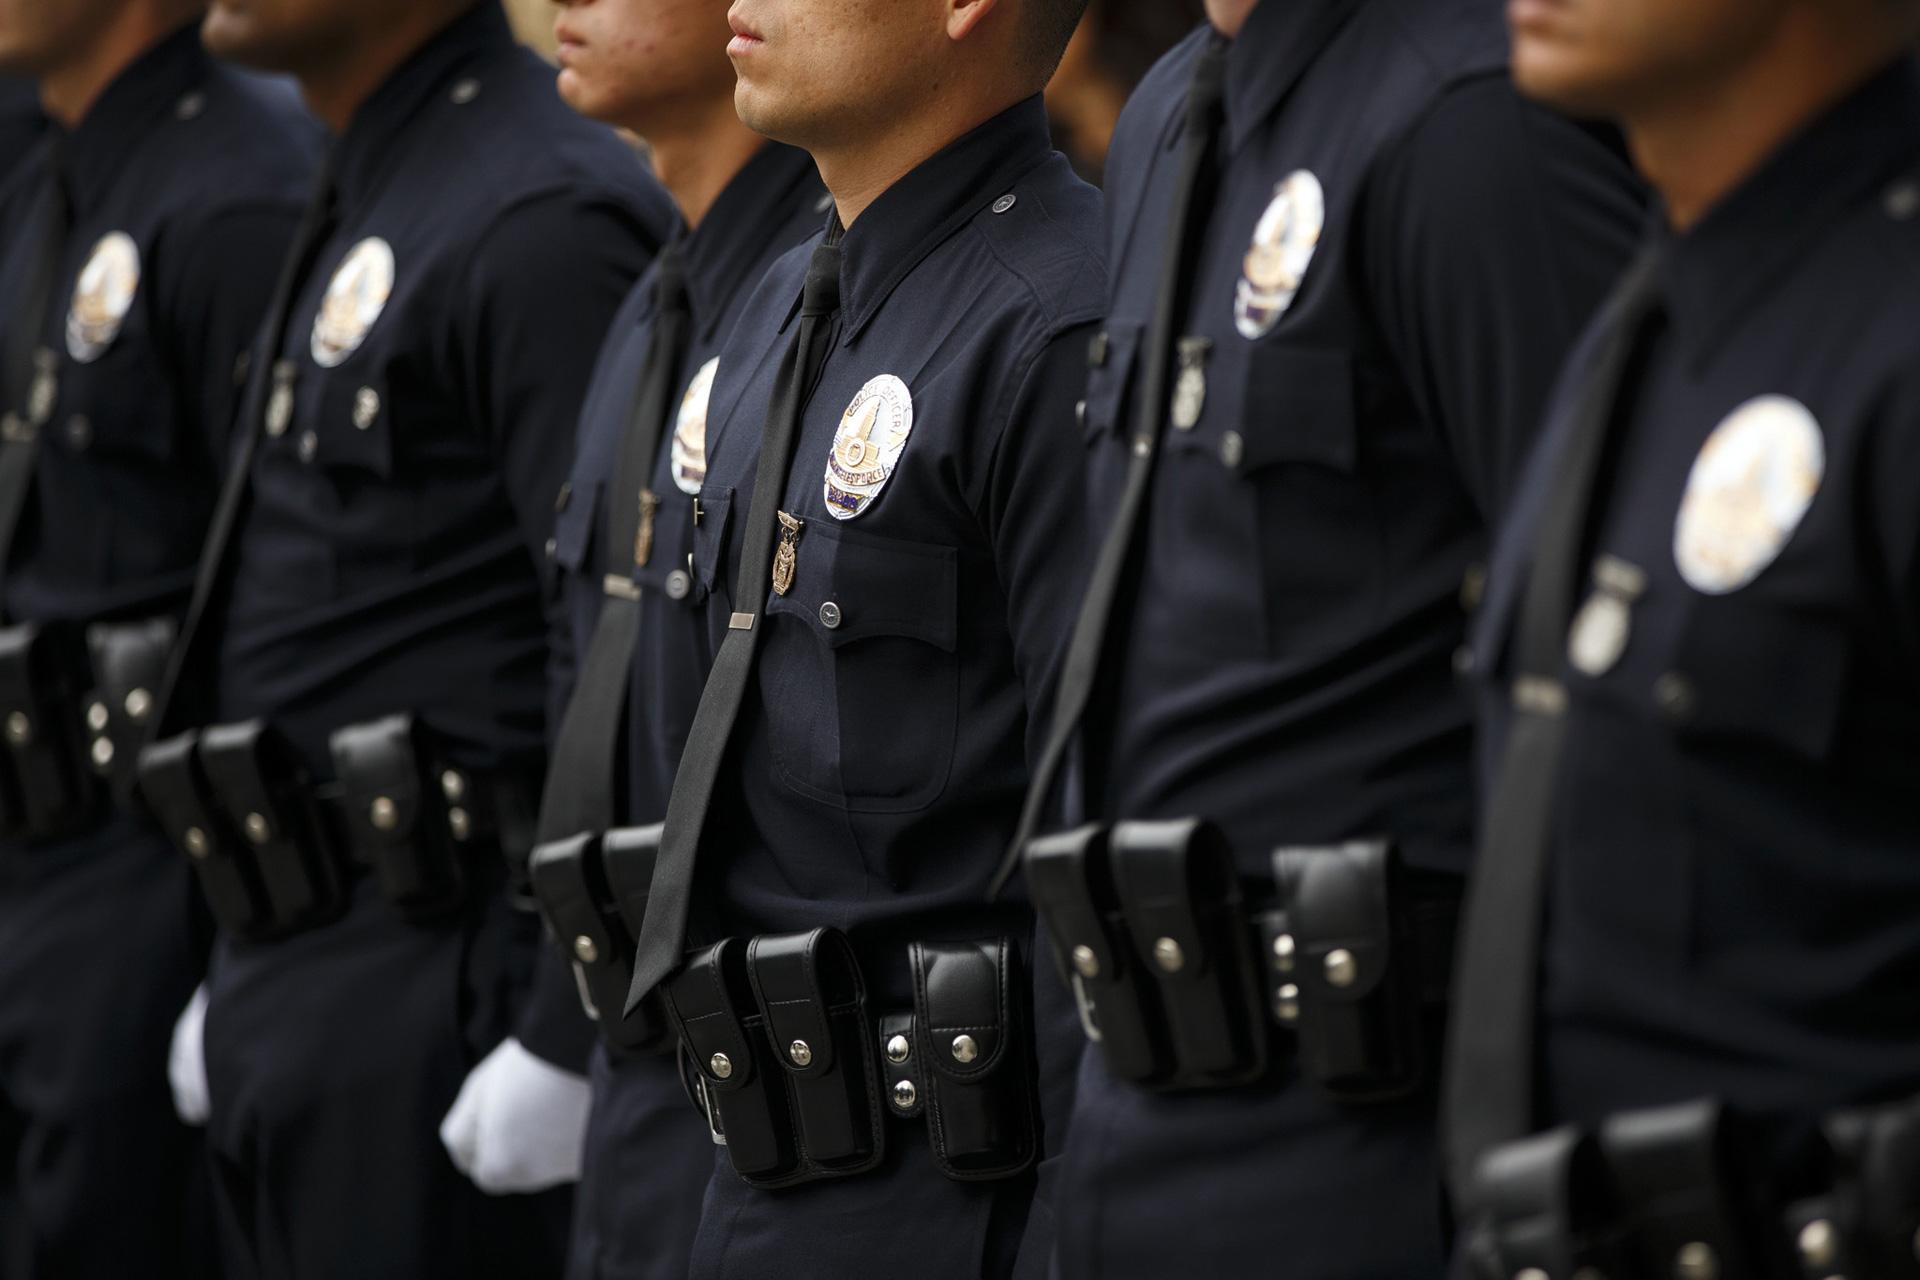 More Police Officers Don't Equal Safer Neighborhoods